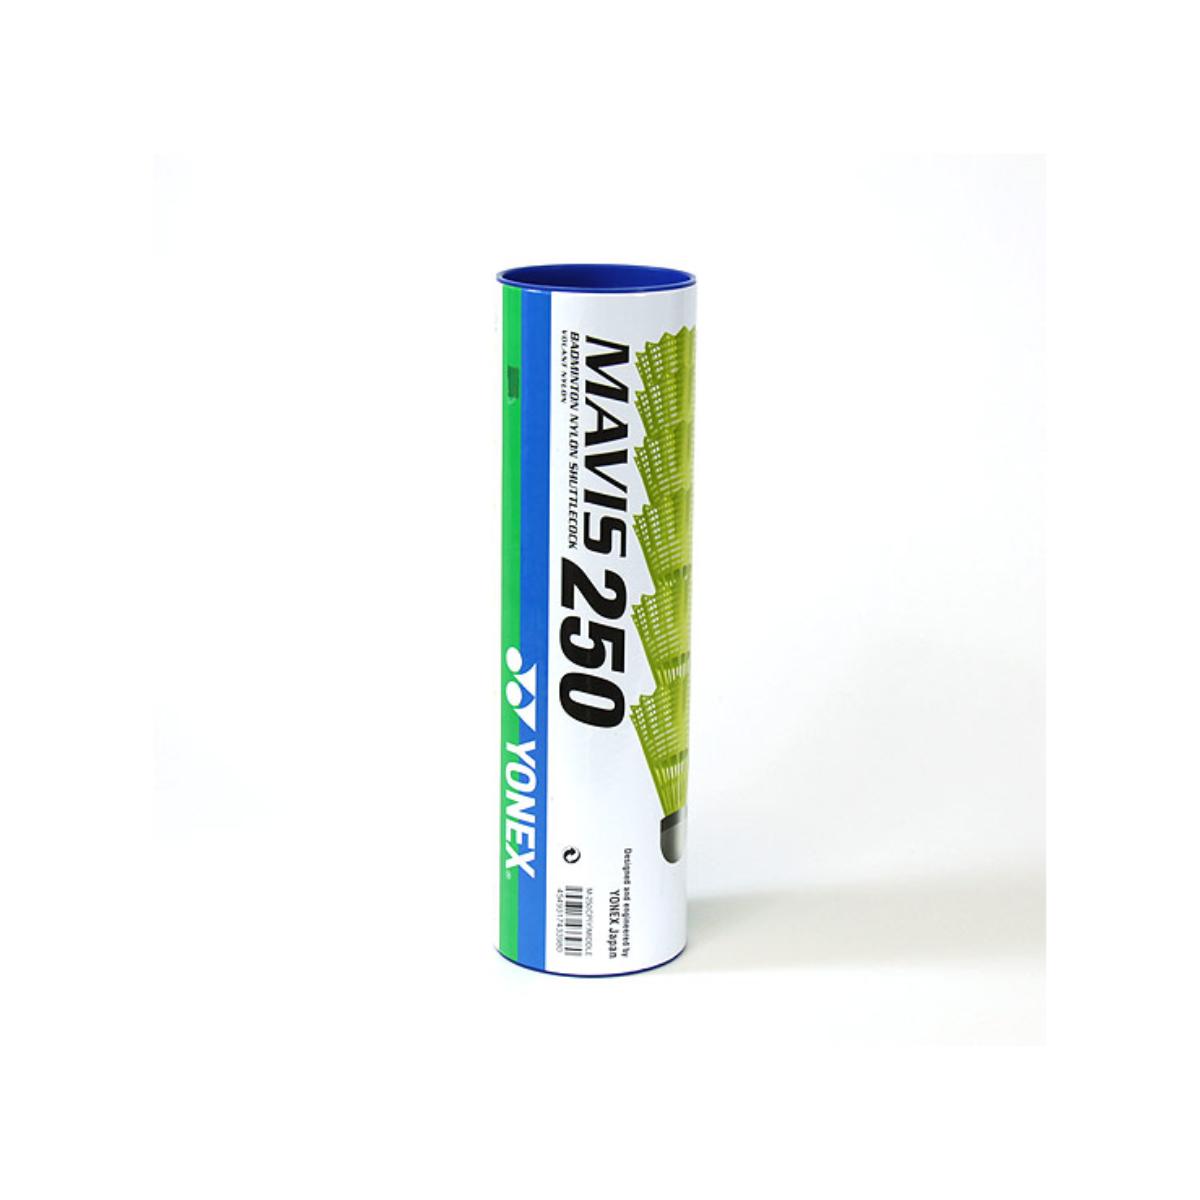 YONEX - Nylonfederball MAVIS-250Detailbild - 0